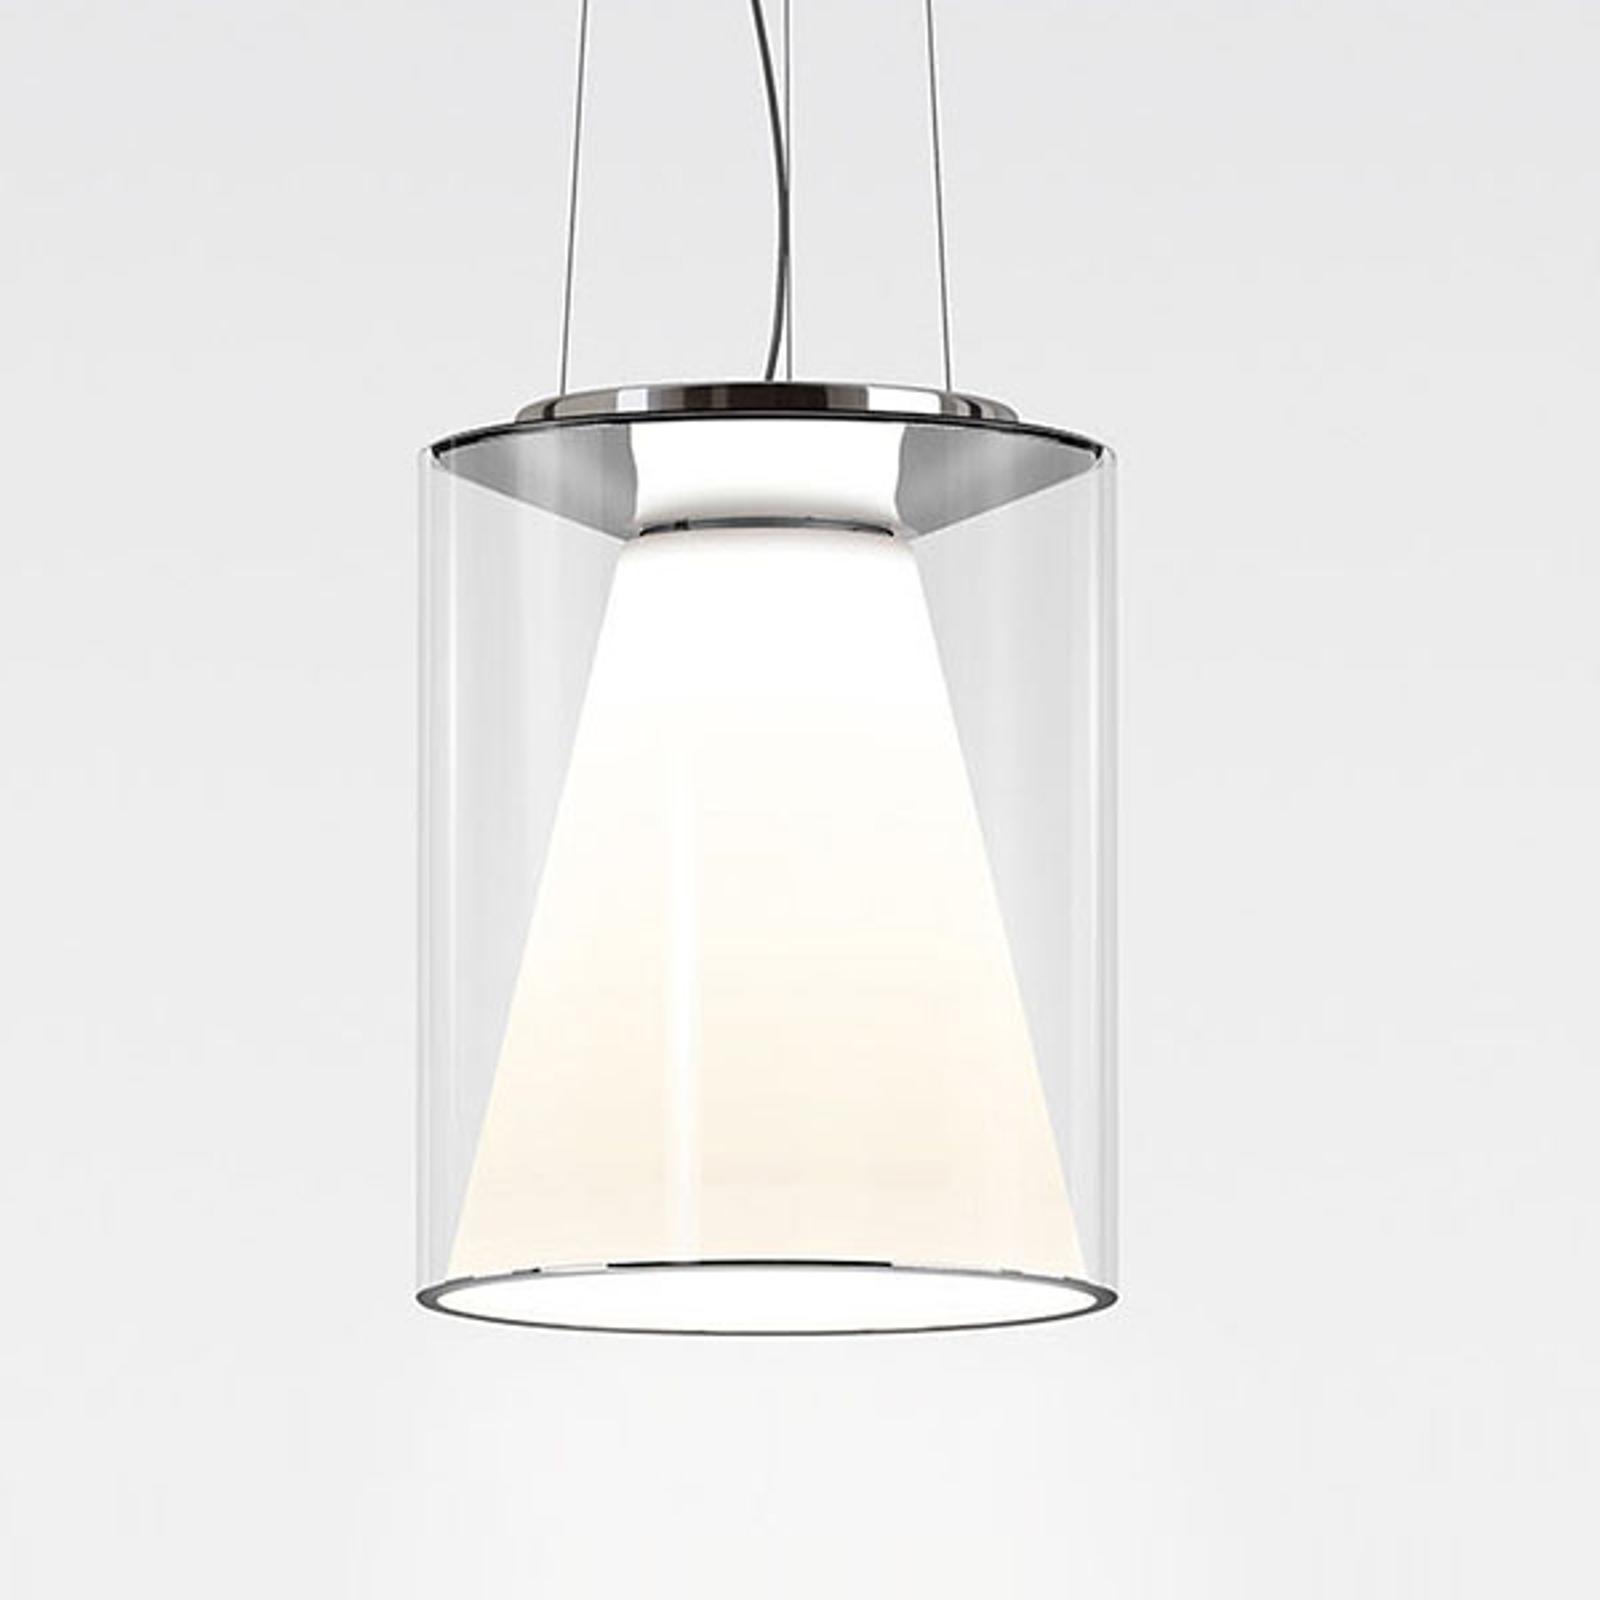 serien.lighting Drum M Pendel Seil 927 Triac hoch